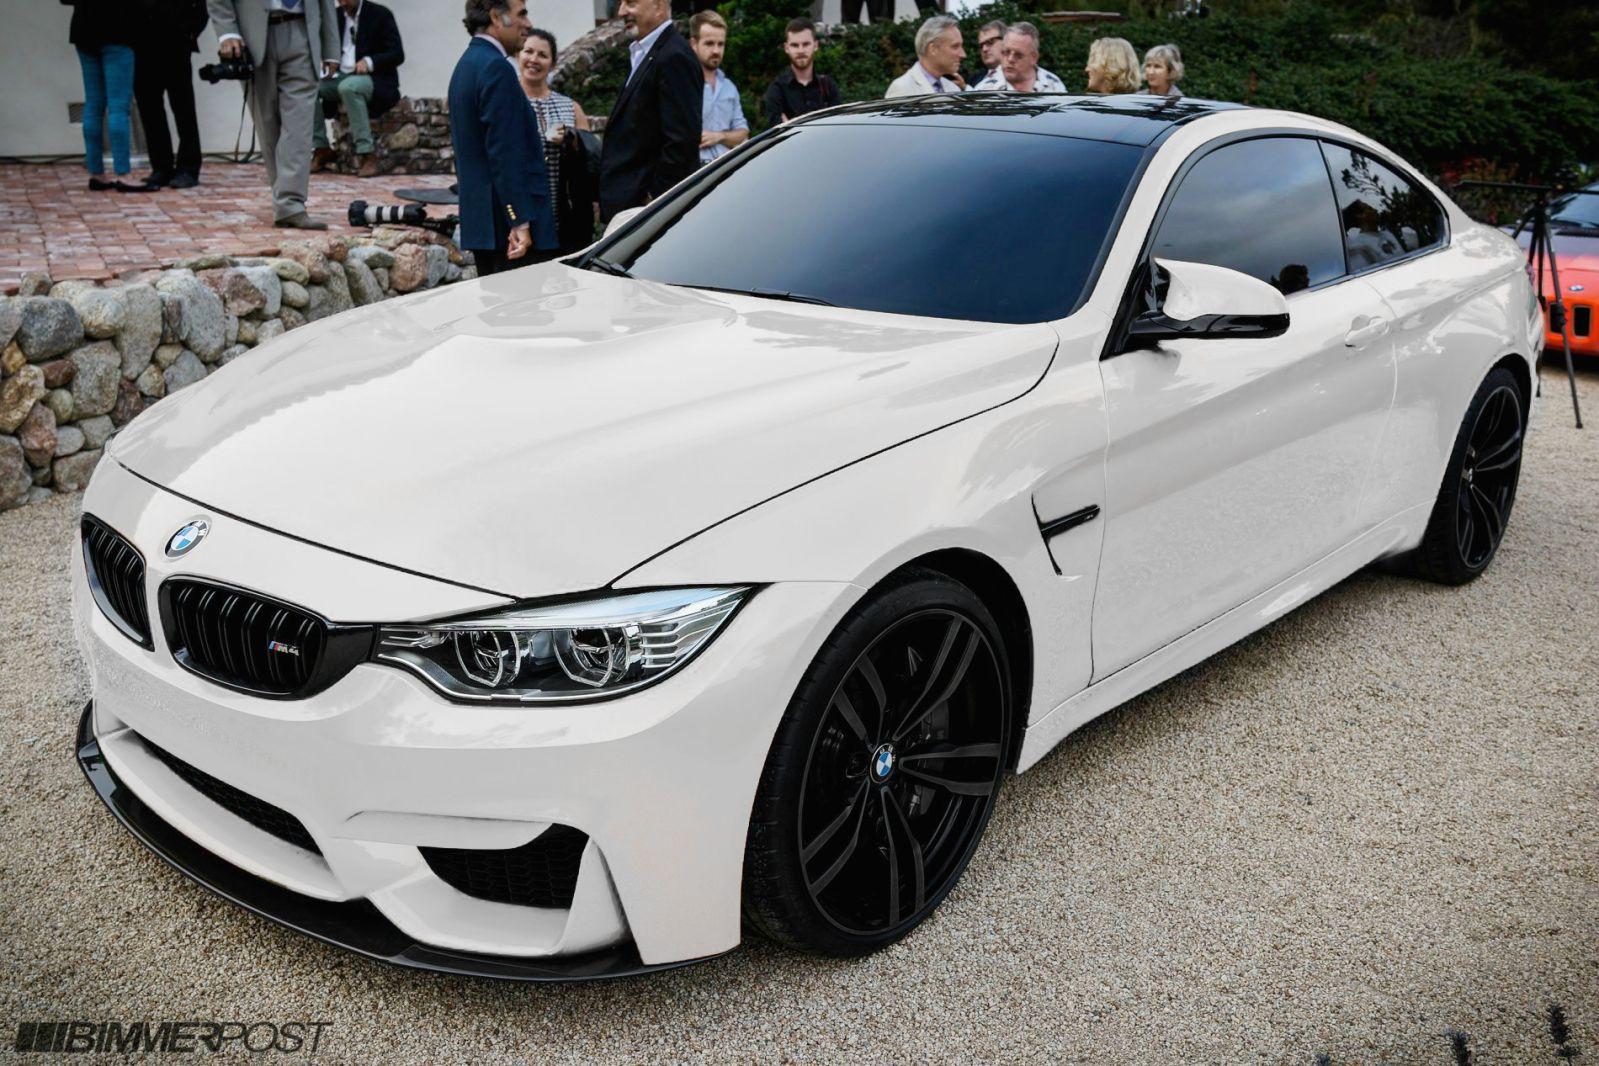 Bmw M4 White With Black Rims | Åutobot | Pinterest | Bmw ...